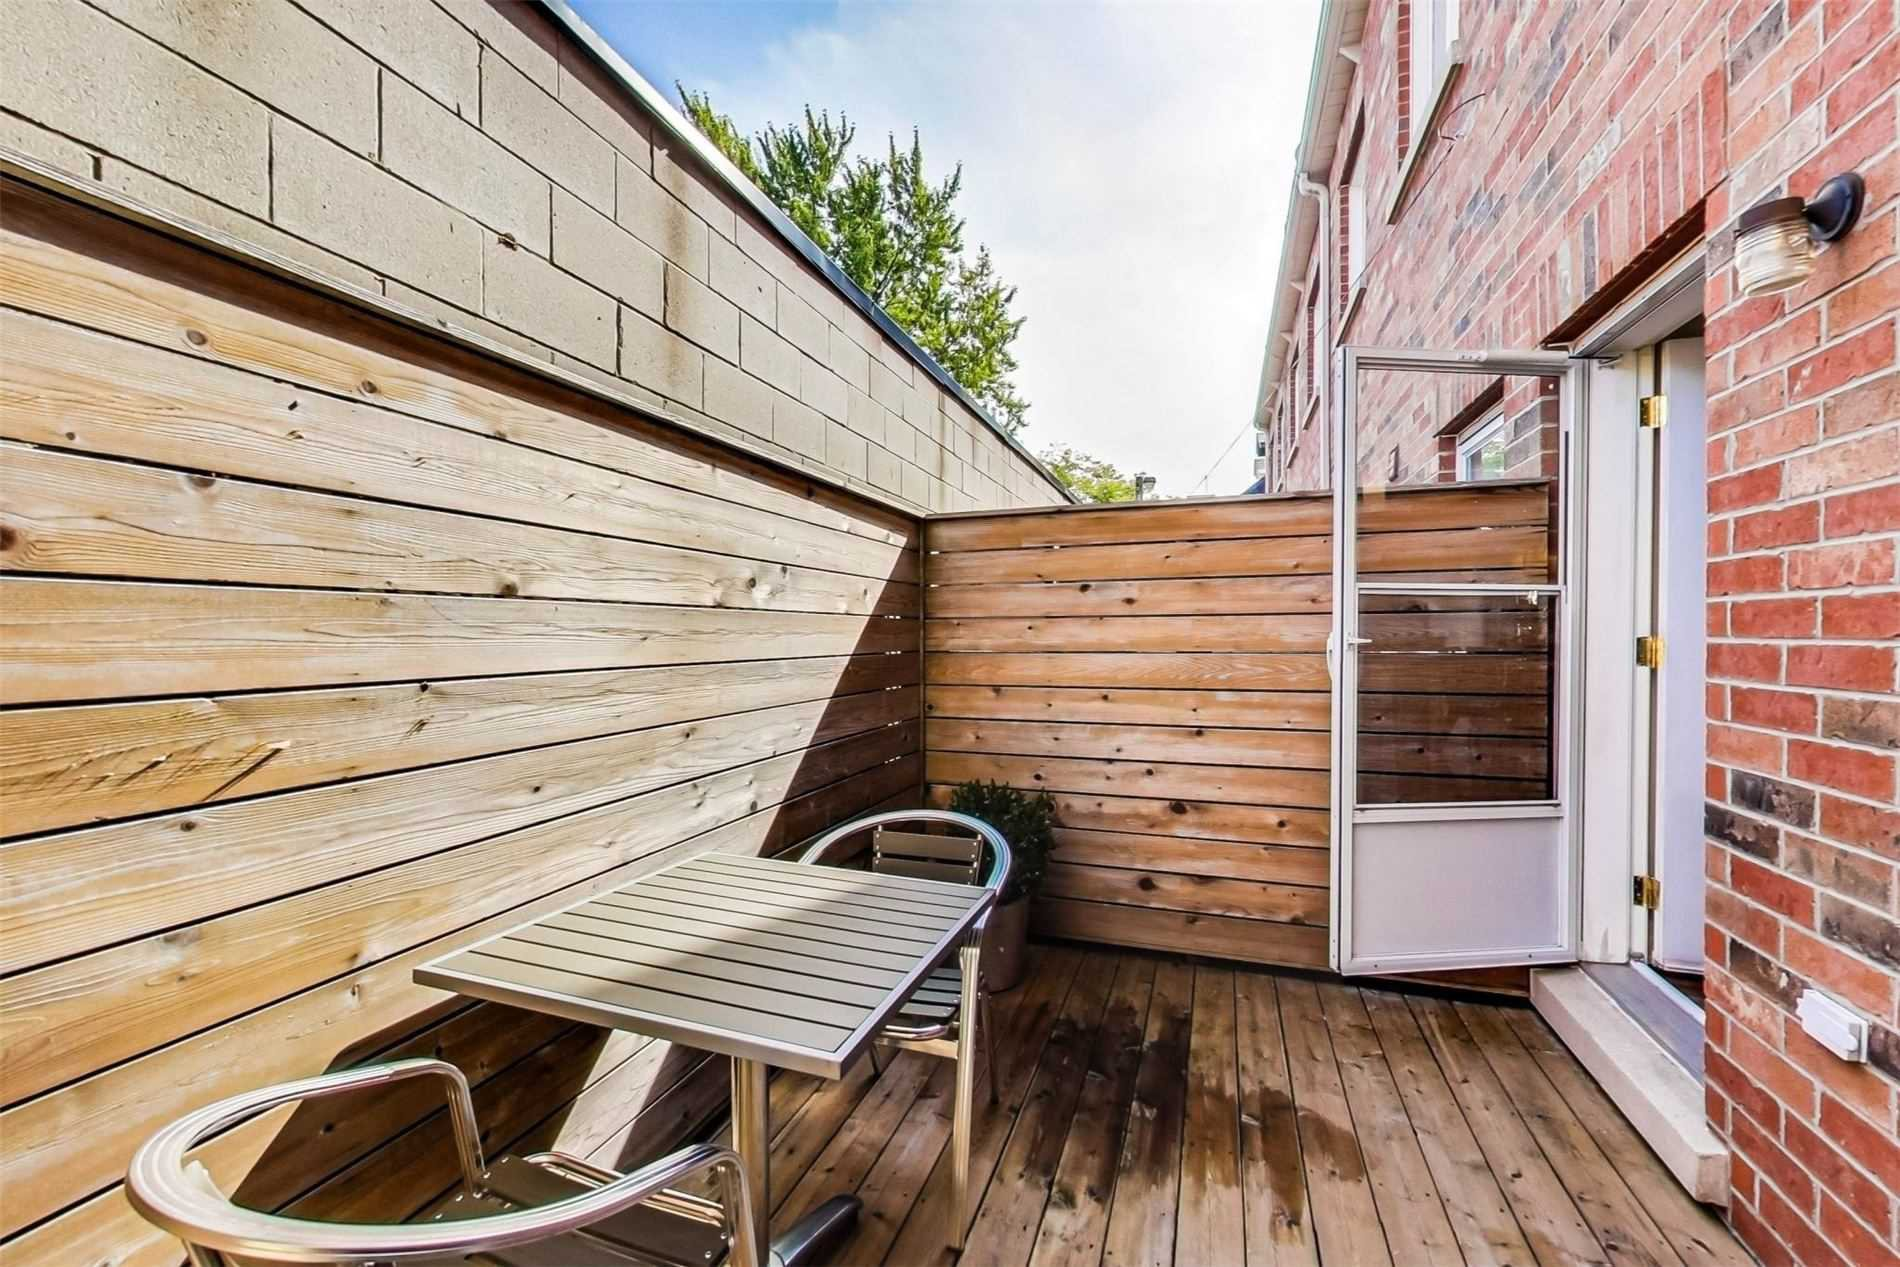 Photo 14: Photos: 213 Heward Avenue in Toronto: South Riverdale House (3-Storey) for sale (Toronto E01)  : MLS®# E4941877